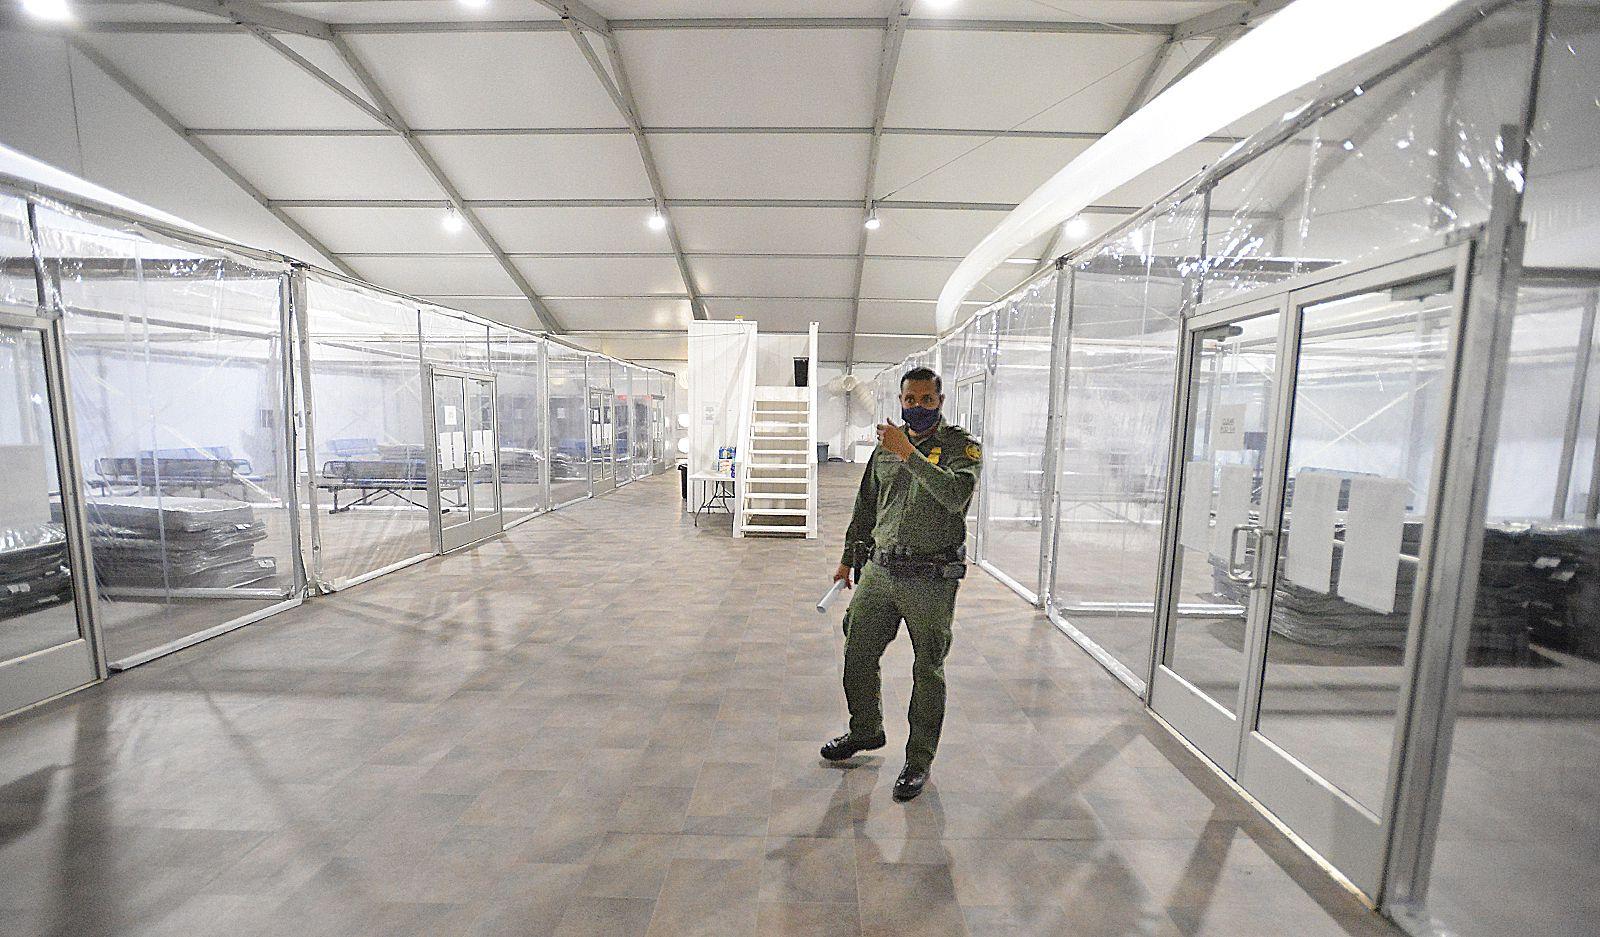 Arizona governor sending National Guard troops to southern border